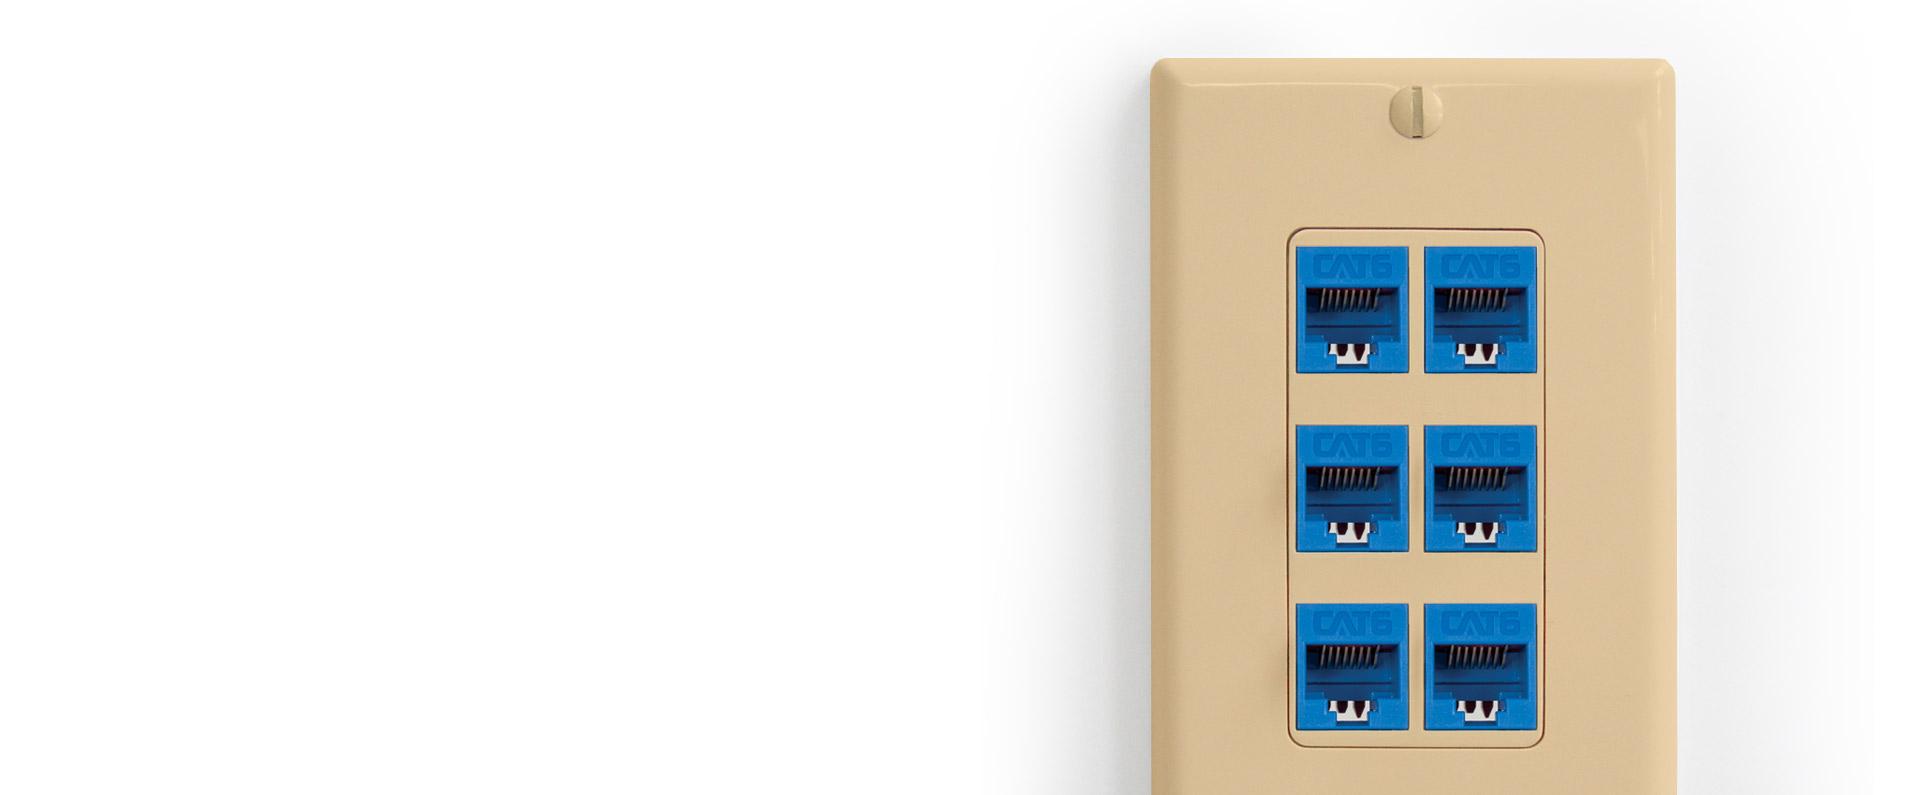 structured cabling solutions icc rh icc com